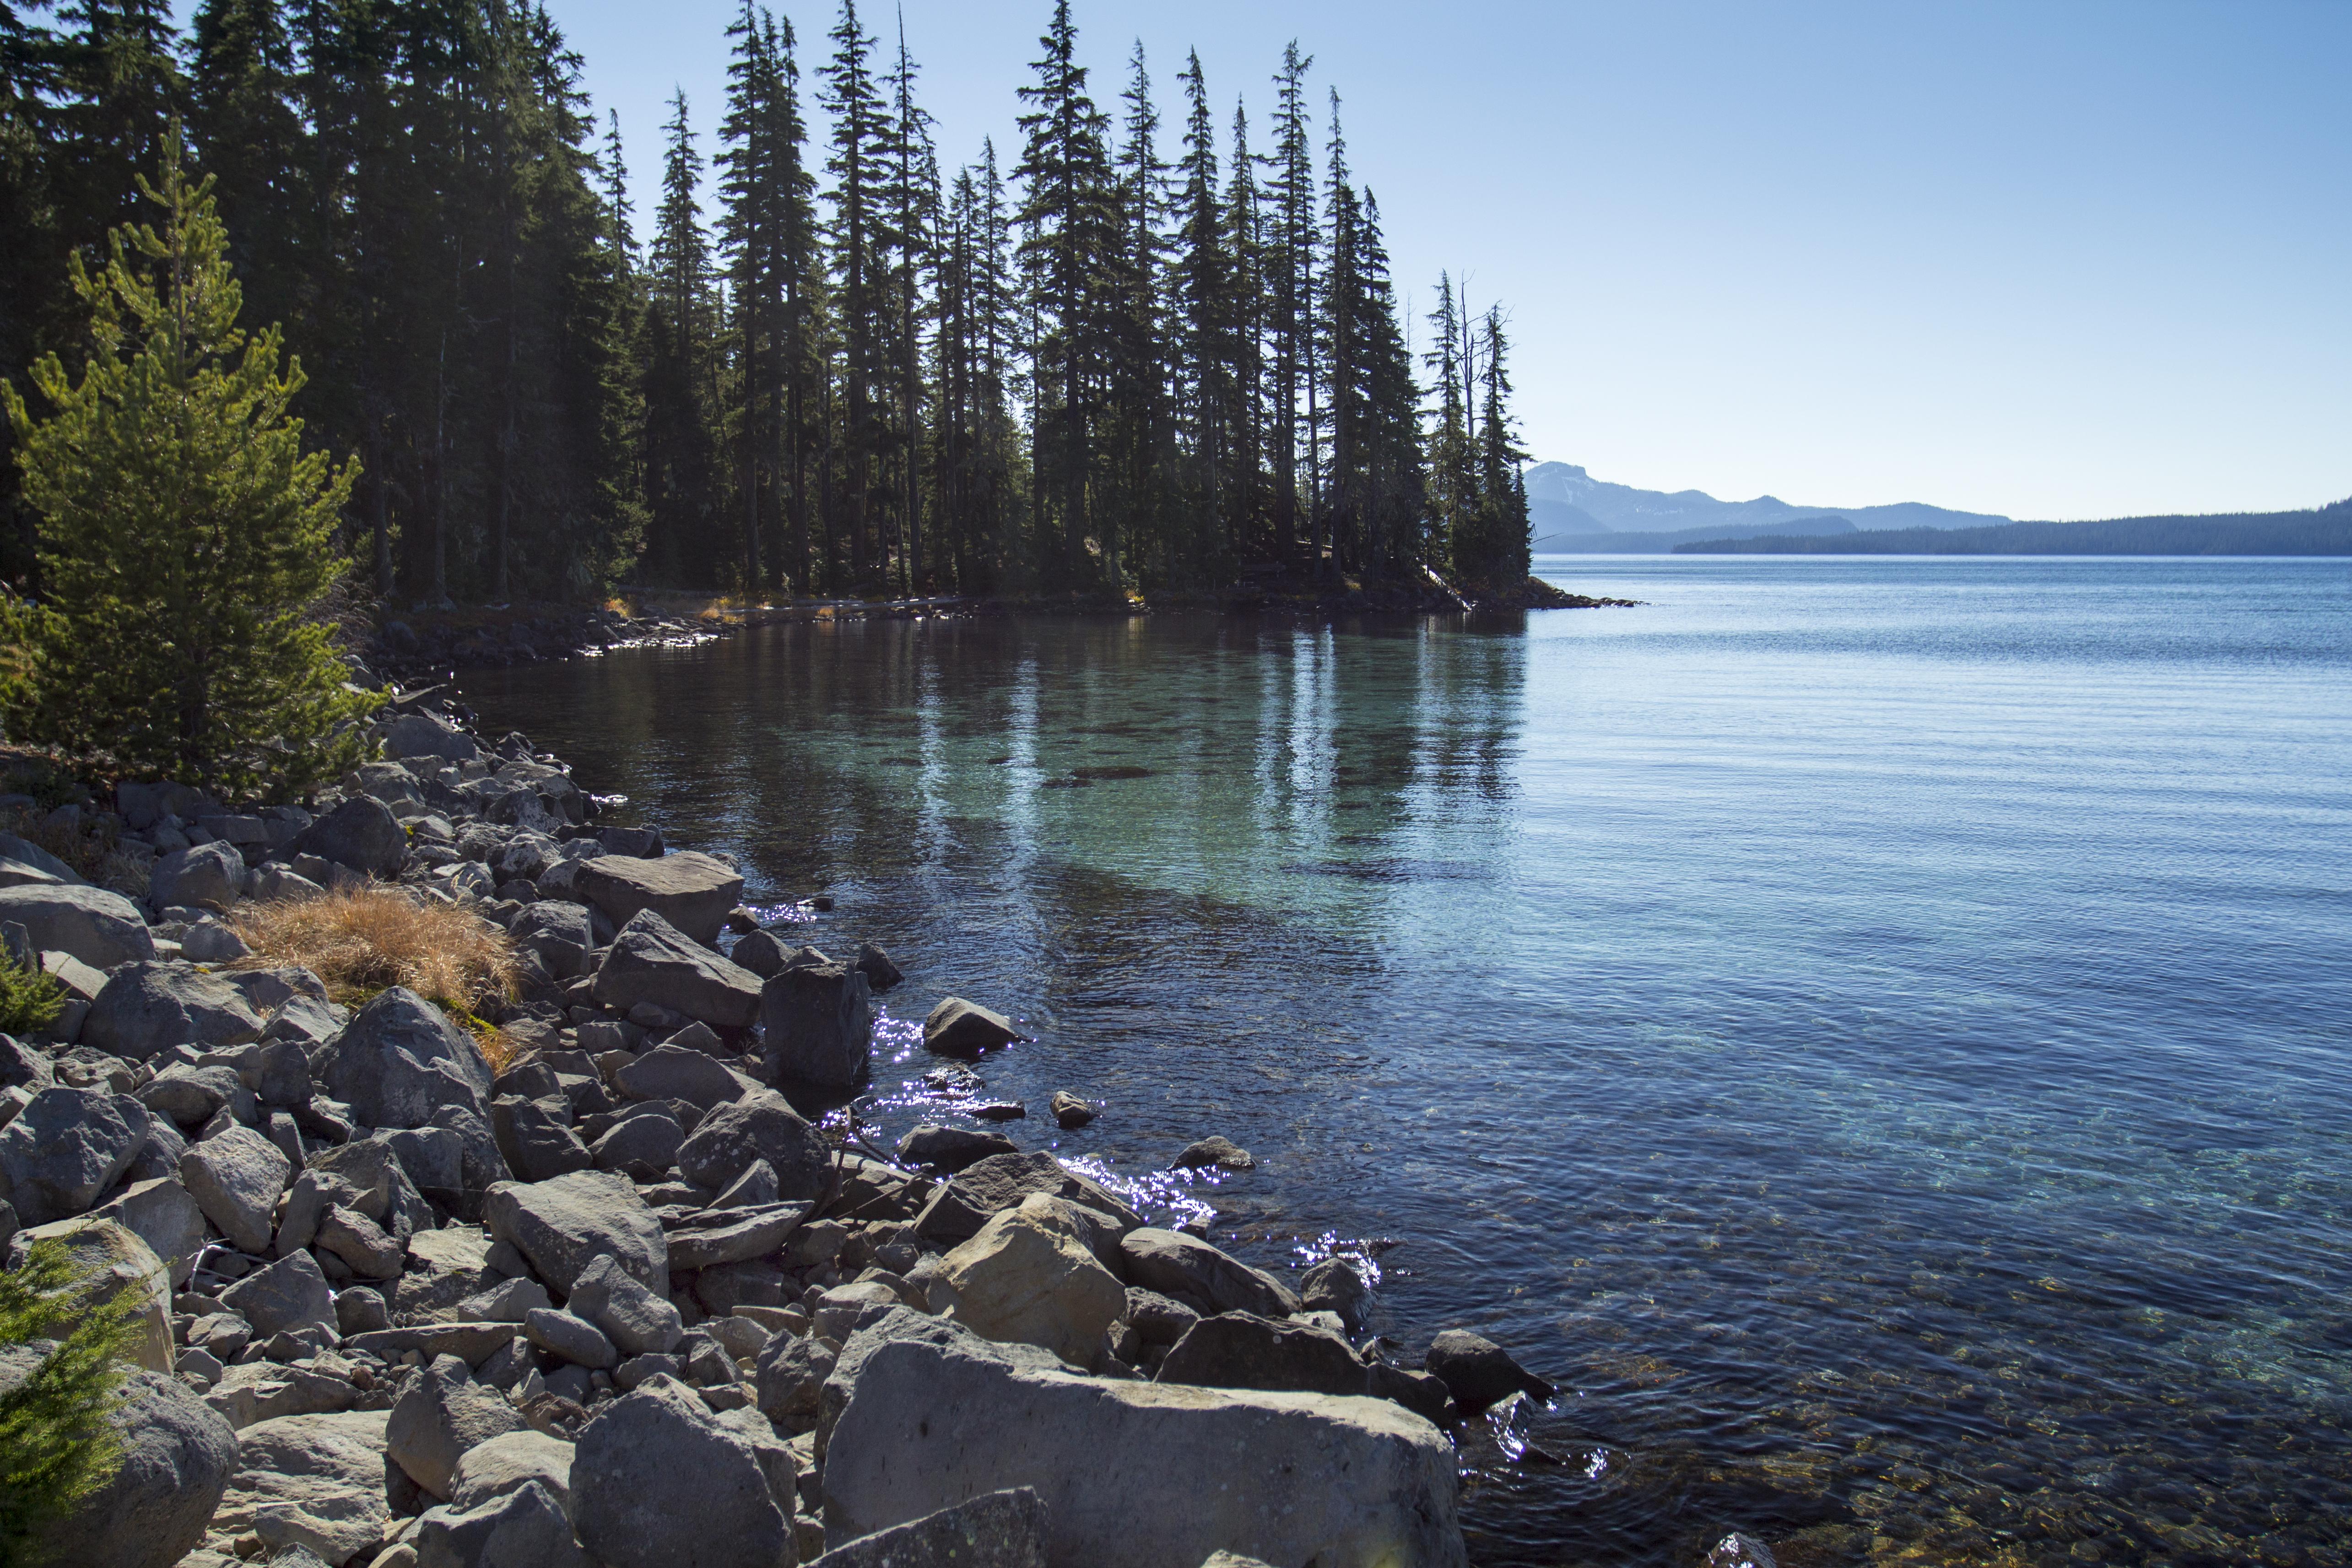 Islet Bay, Waldo Lake, Oregon, Aqua, Bay, Blue, Calm, HQ Photo